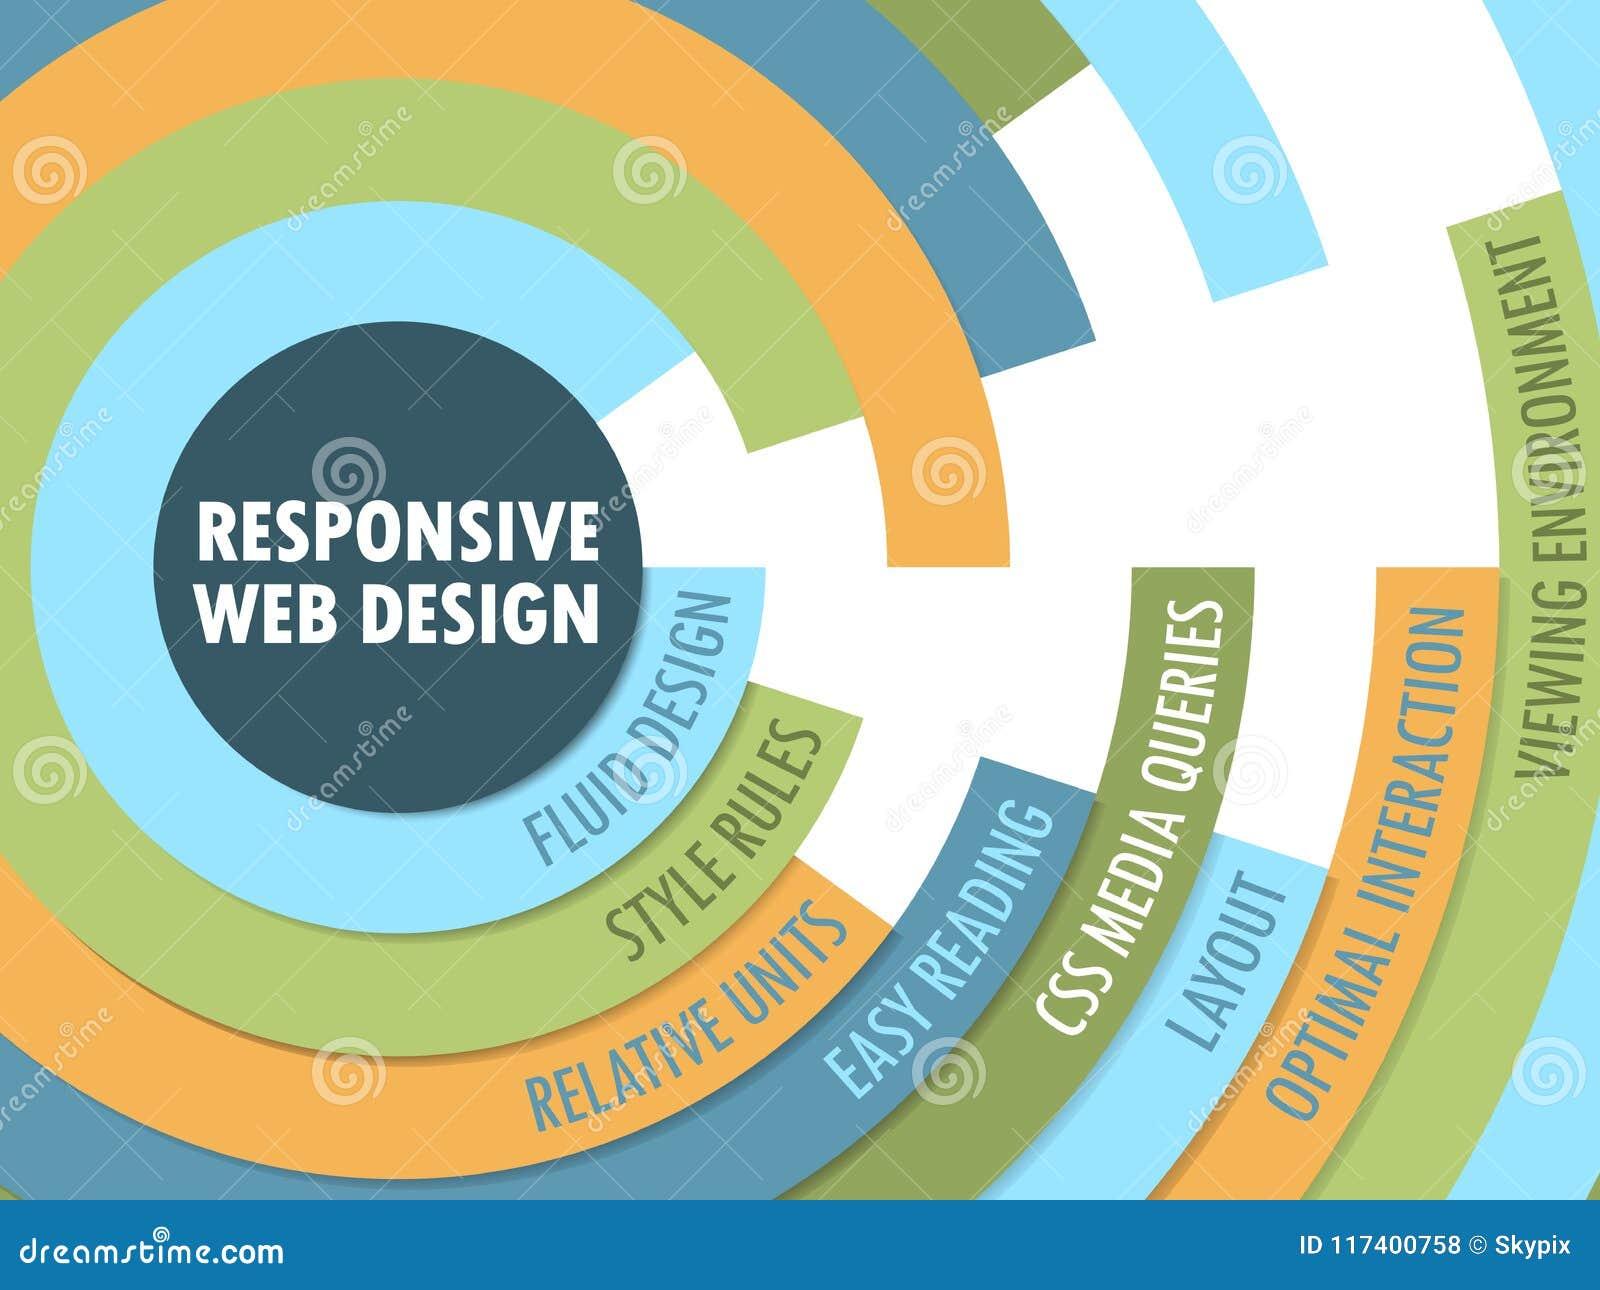 Responsive Web Design Radial Format Tag Cloud Stock Illustration Illustration Of Customer Utility 117400758